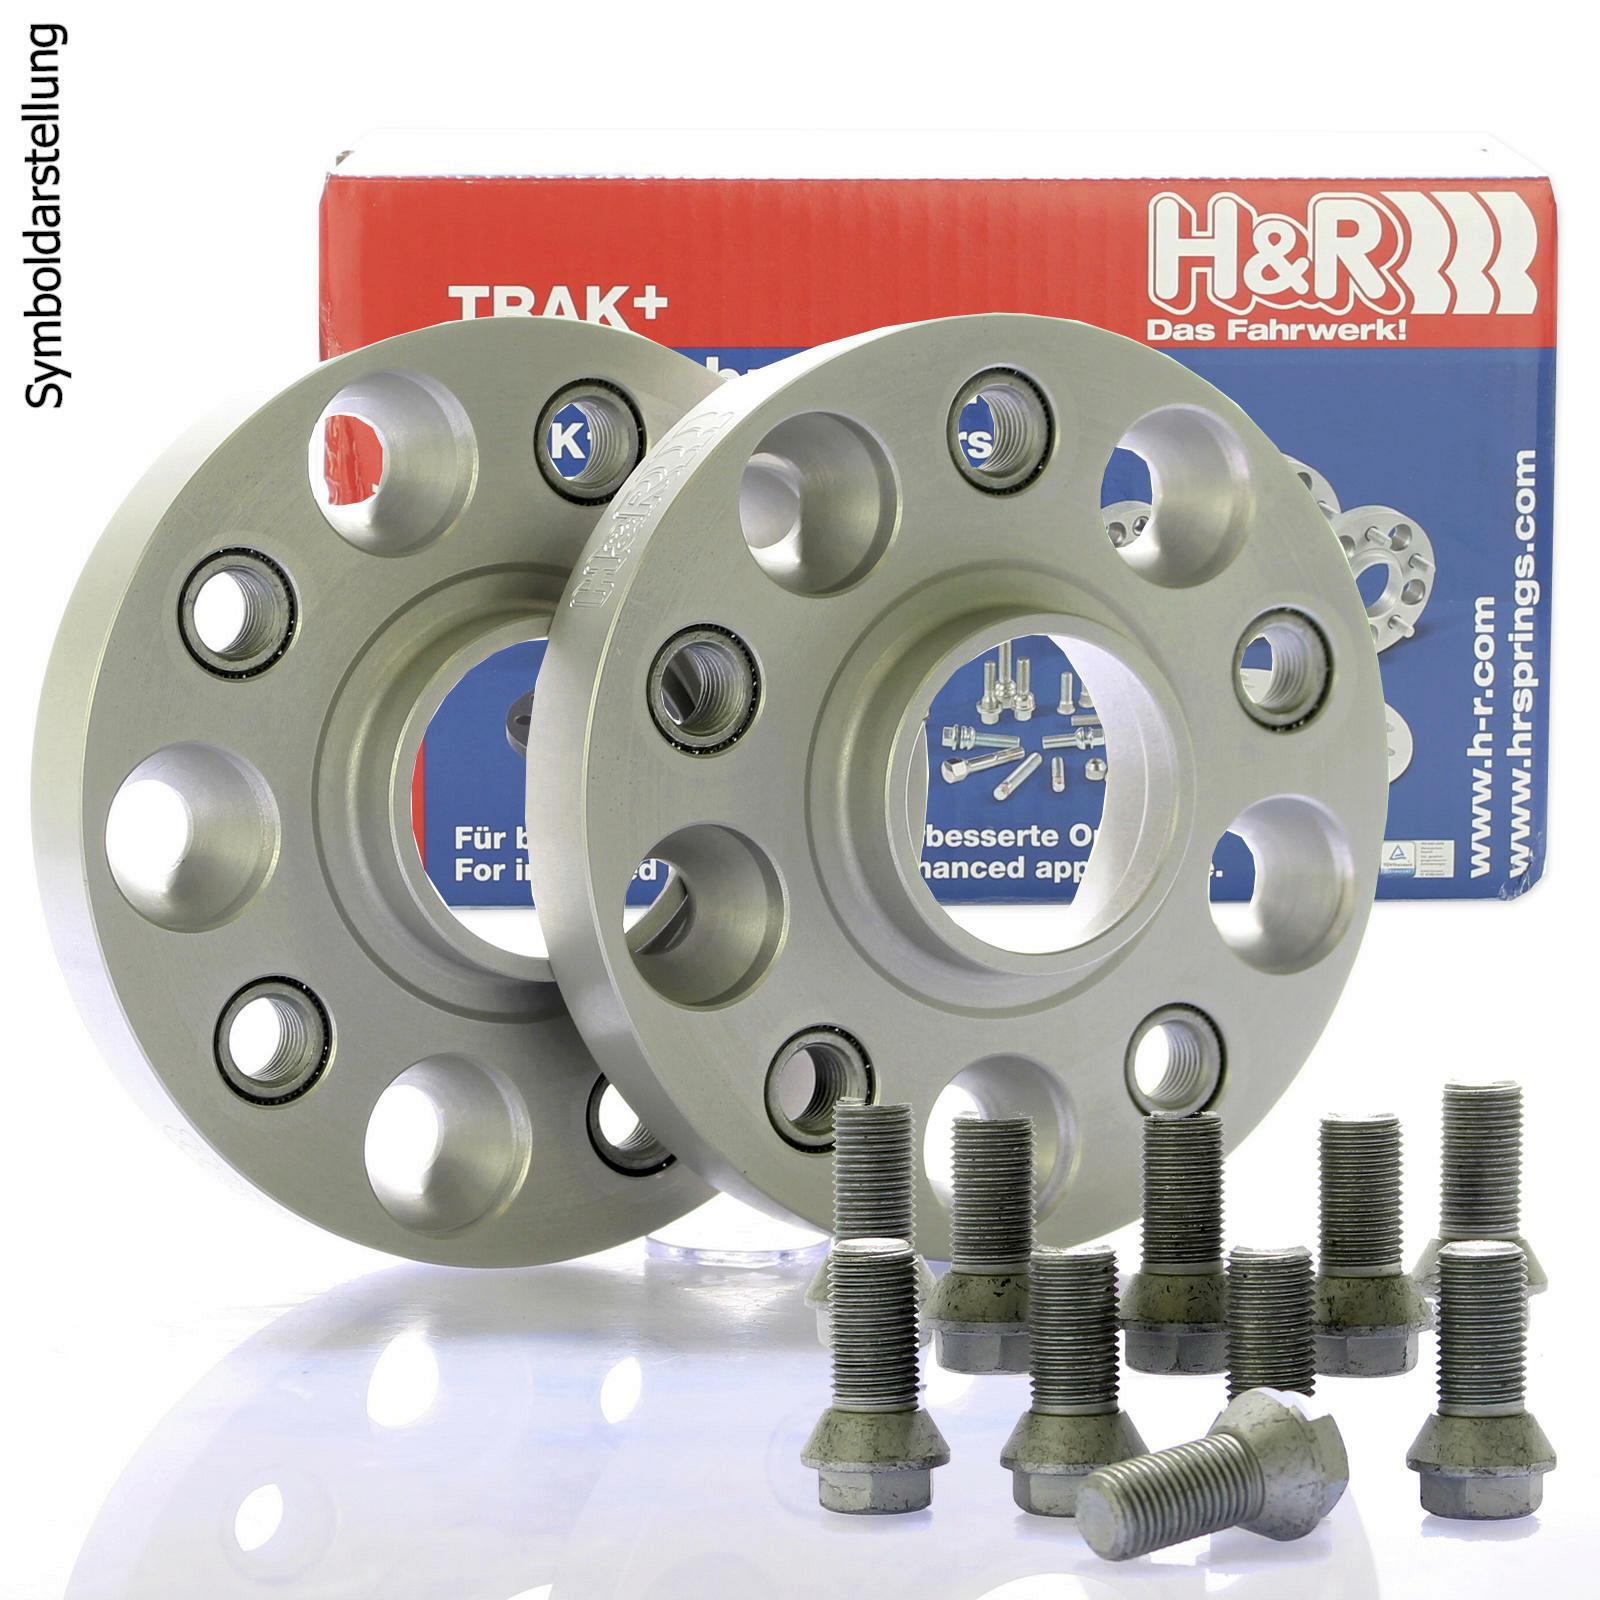 H&R DRA Spurplatten Spurverbreiterung Distanzscheibe 4x100 40mm // 2x20mm